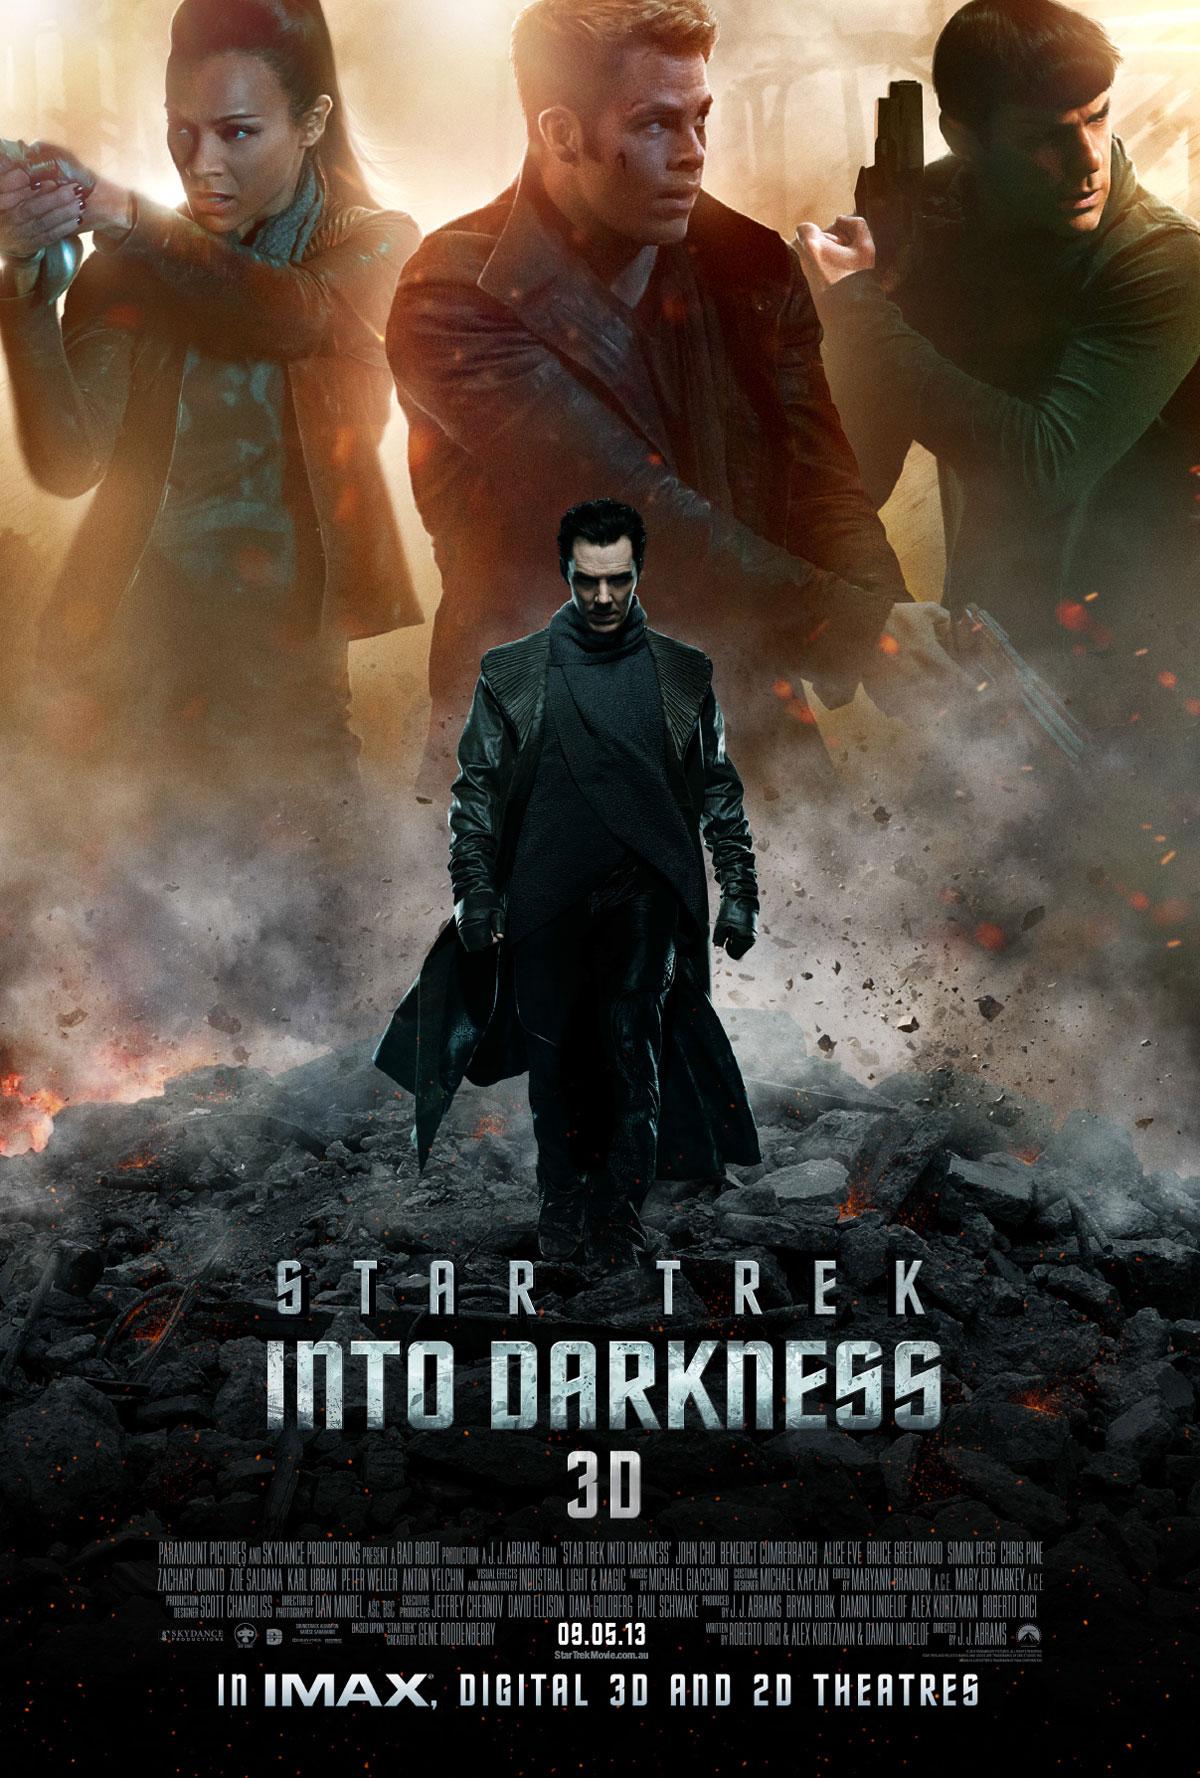 International Star trek Into Darkness Poster